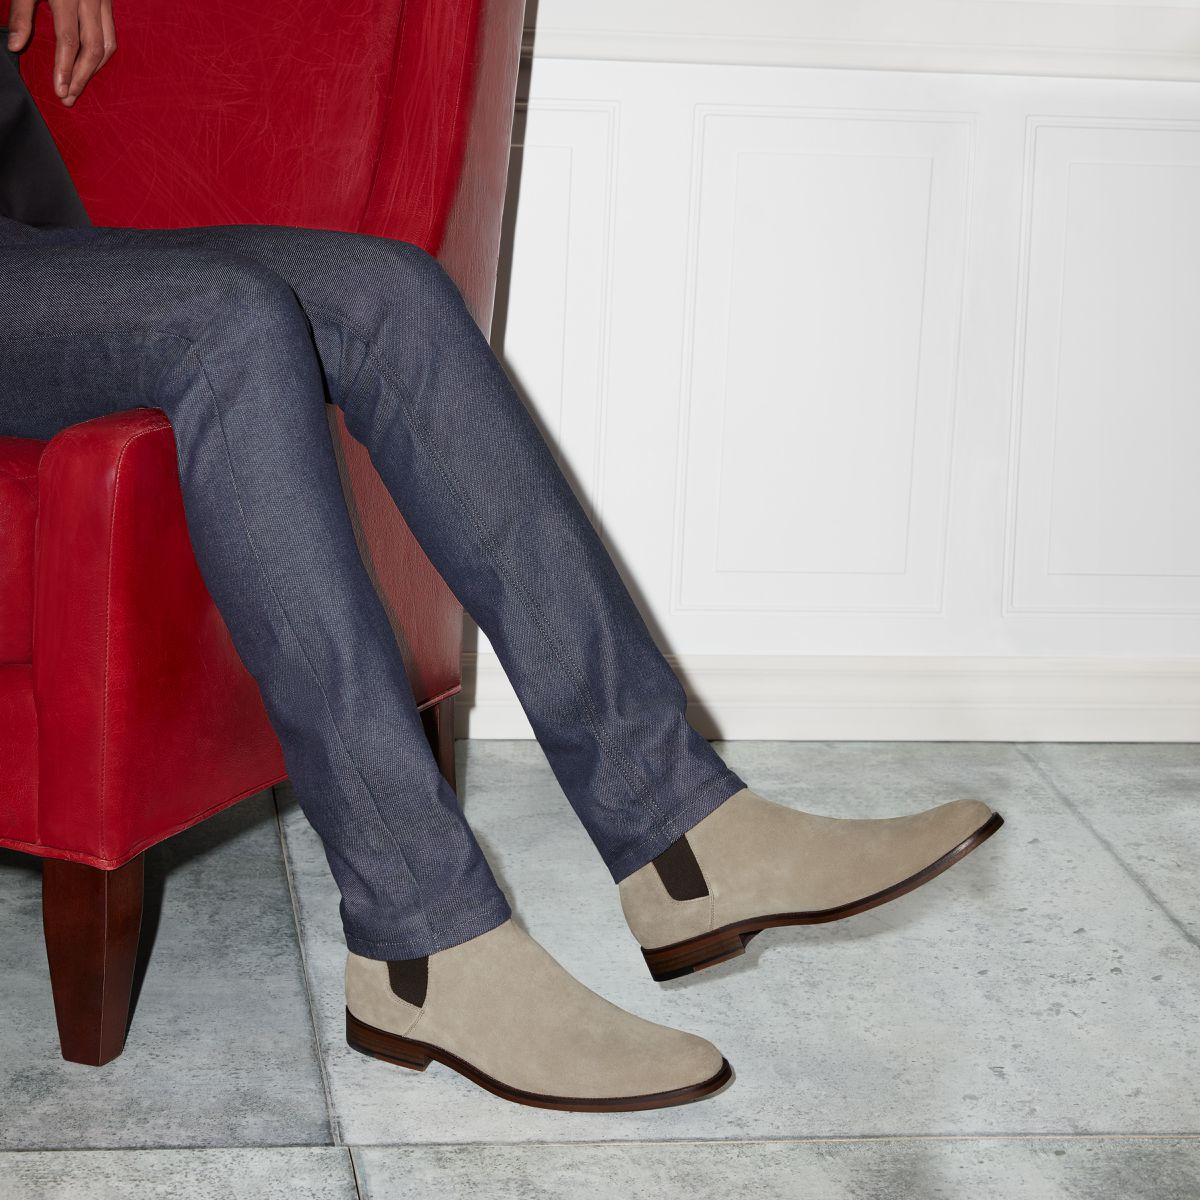 aldo shoes uncomfortable feeling in urethra men picture